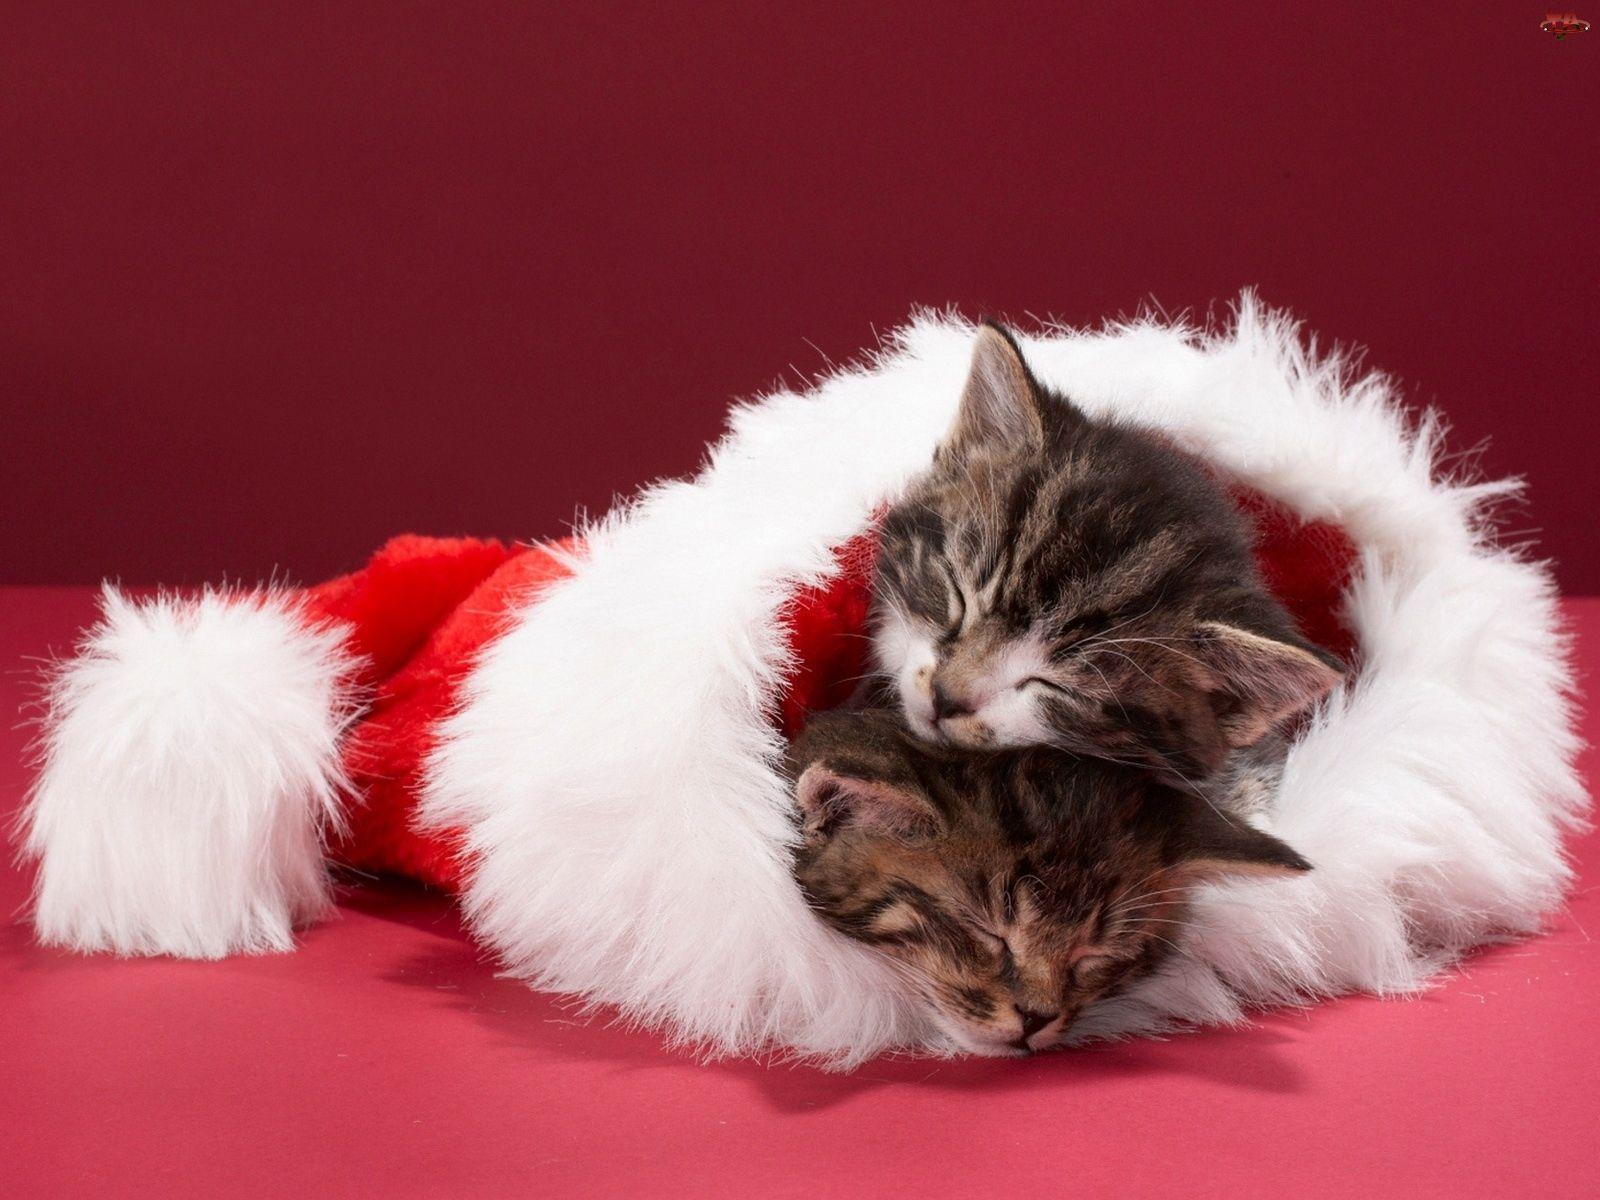 Christmas Kittens Christmas Kitten Cat Sleeping Christmas Animals